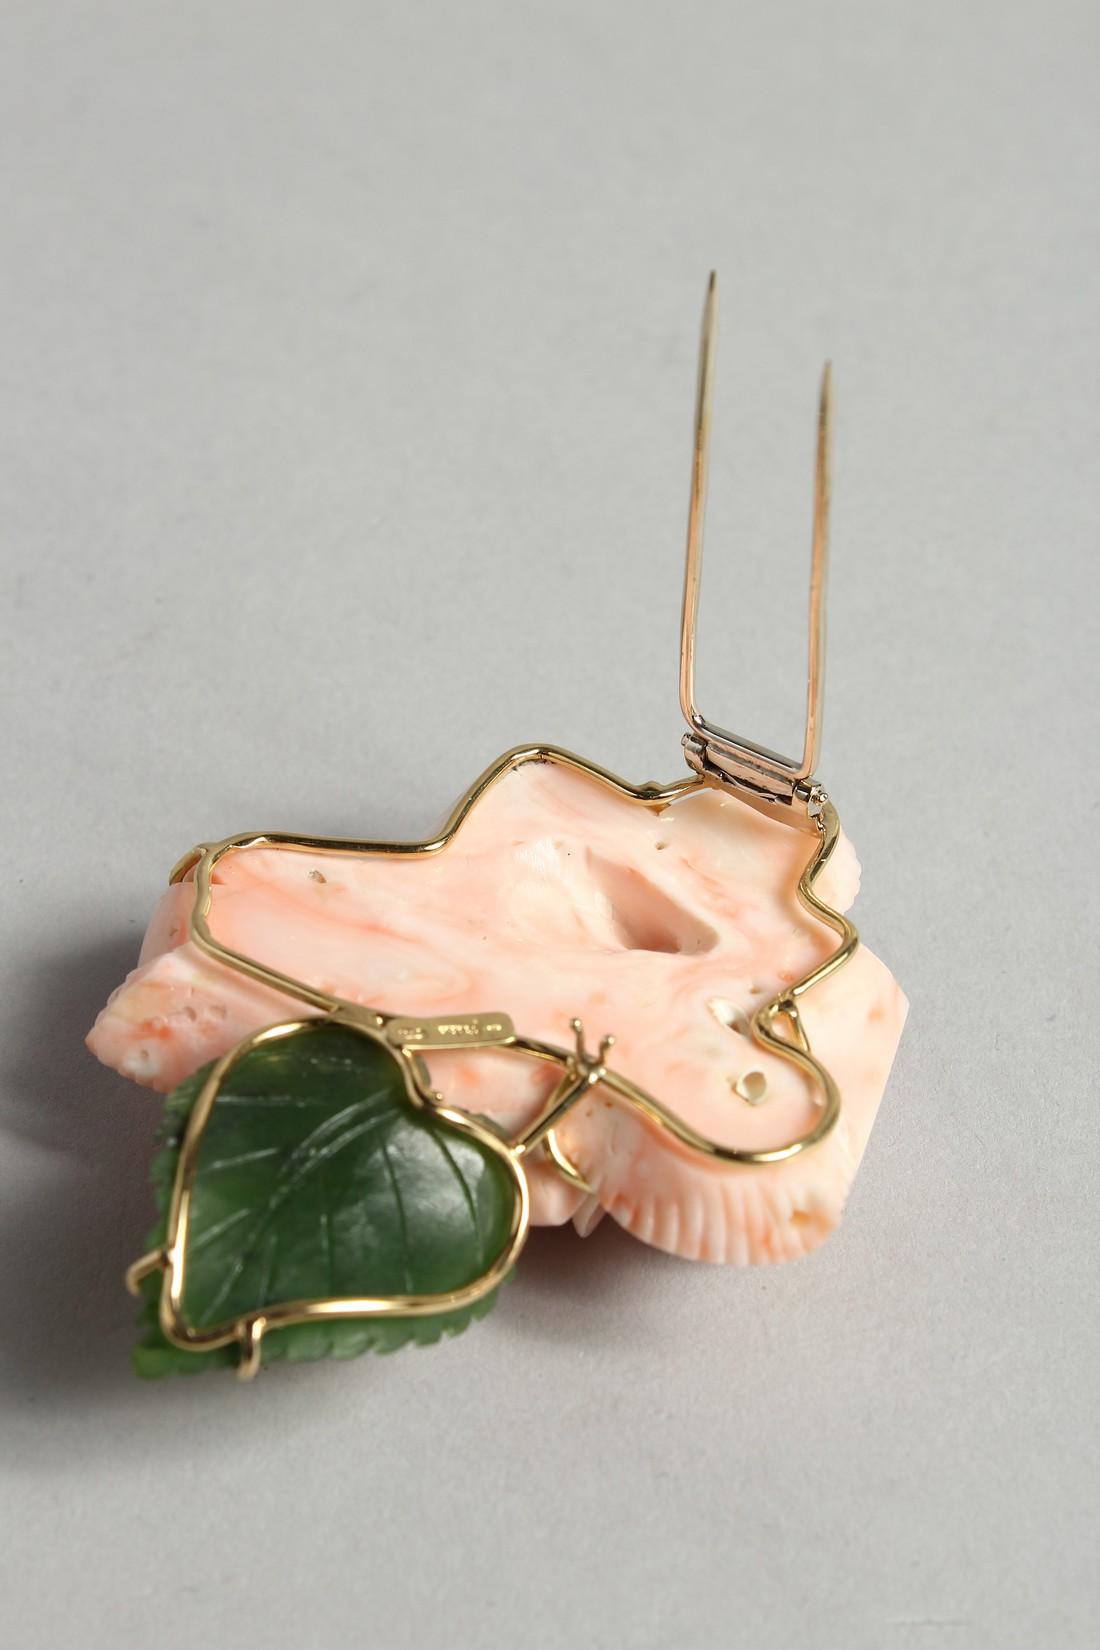 A SUPERB 18CT GOLD, CORAL ROSE AND LEAF BROOCH - Image 4 of 6